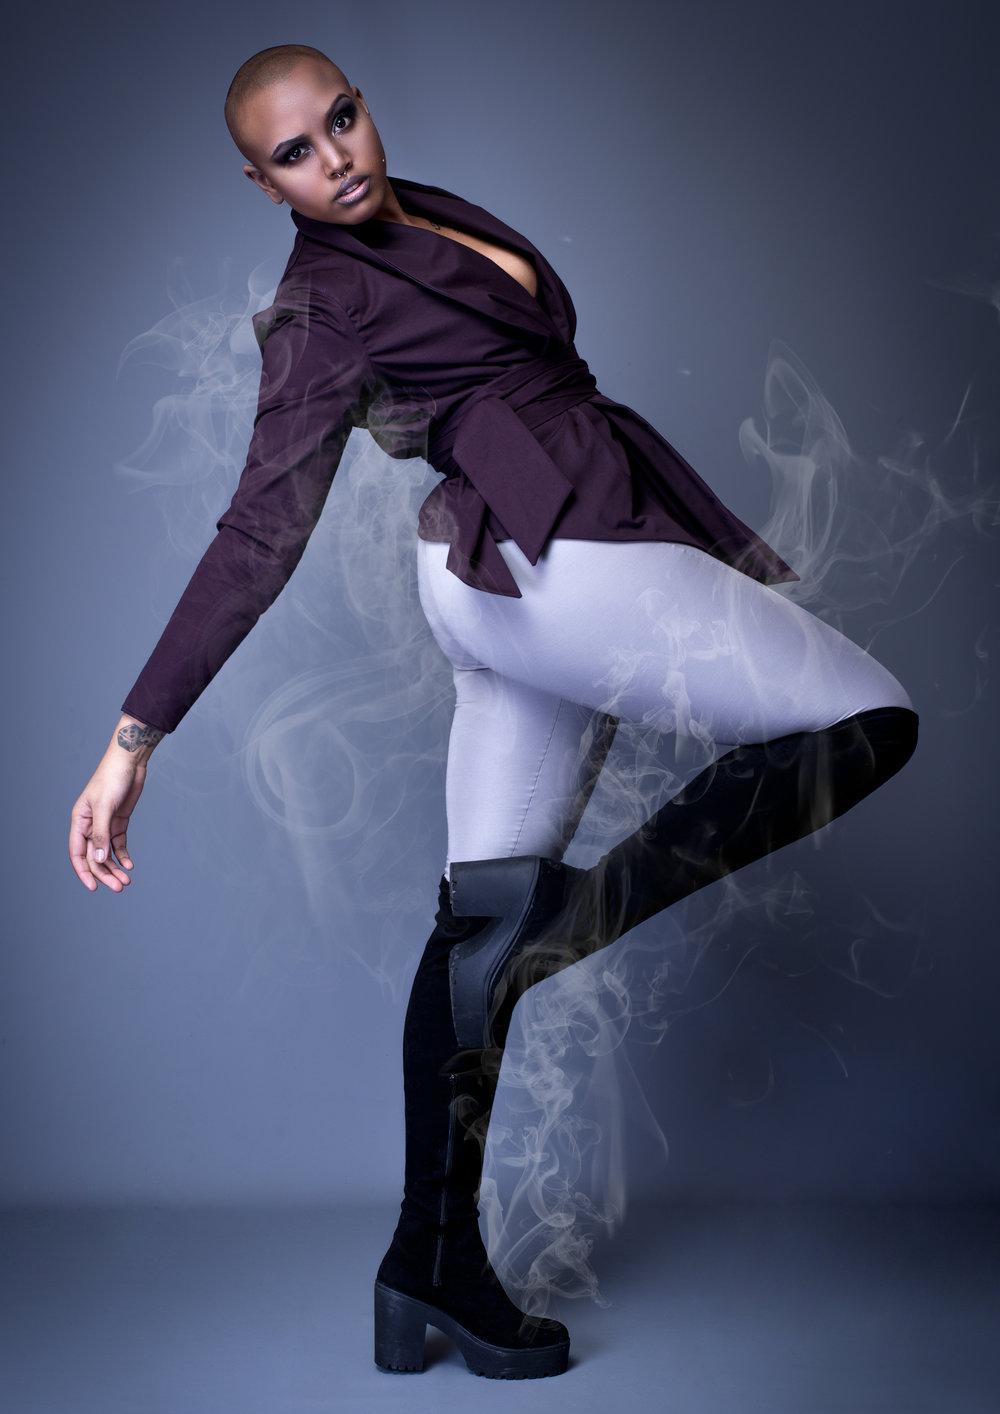 zaramia-ava-zaramiaava-leeds-fashion-designer-leedsfashiondesigner-stylist-leeds-stylist-leedsstylist-ethical-sustainable-minimalist-versatile-drape-wrap-purple-cowl-5